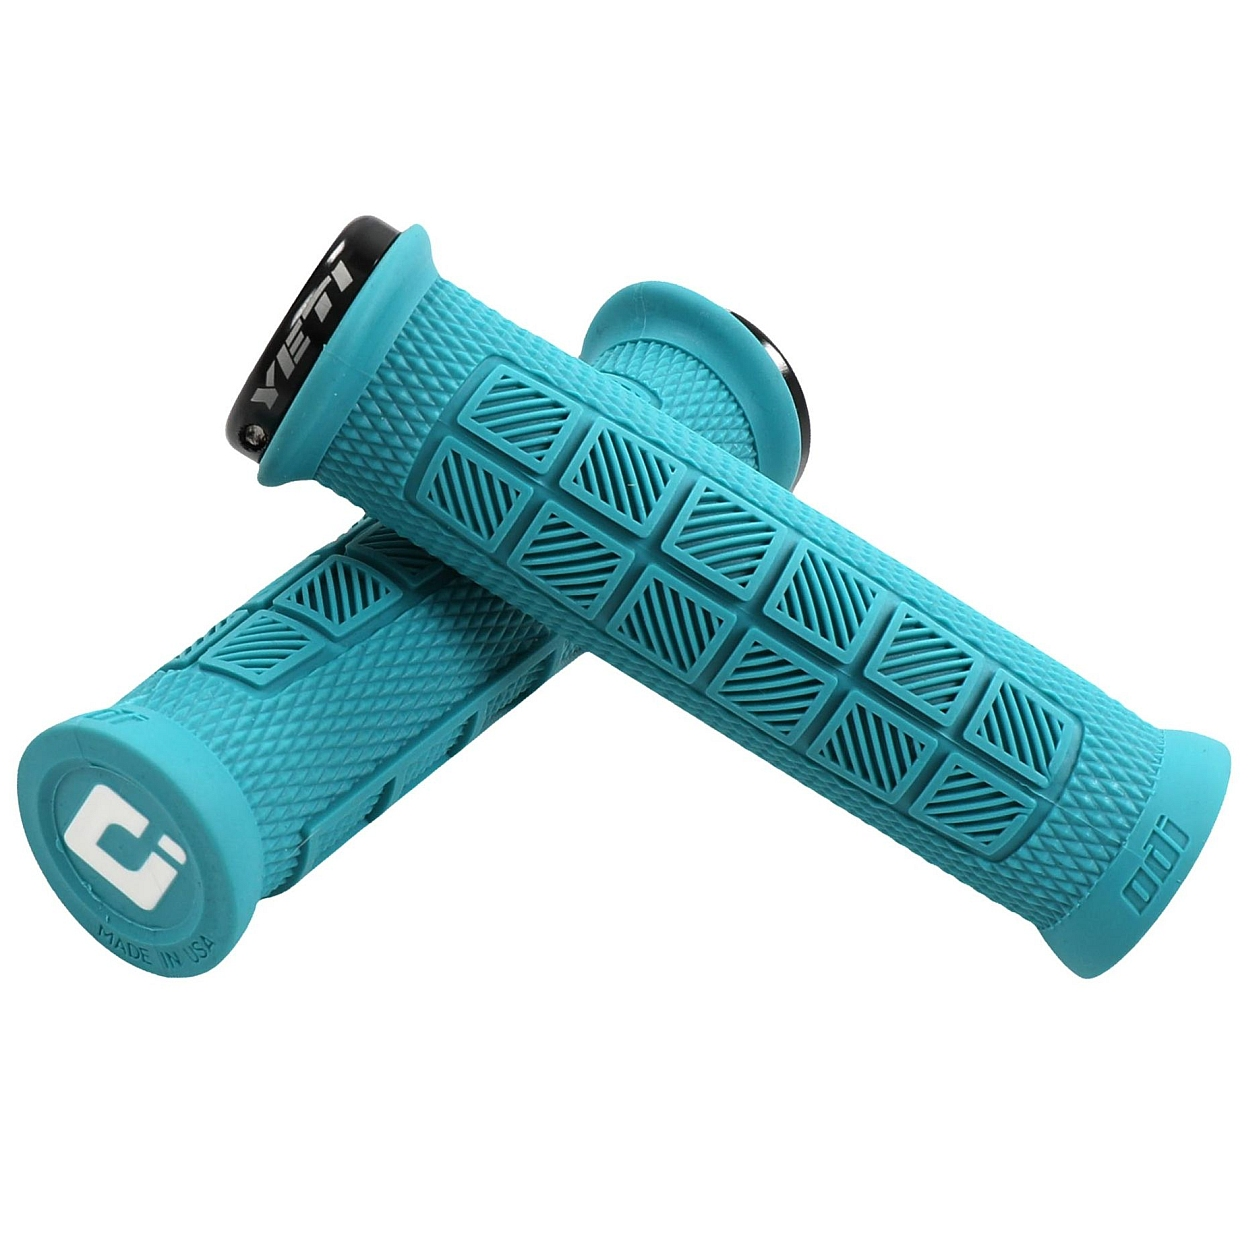 Yeti Cycles ODI ELITE PRO Yeti Grips - turquoise